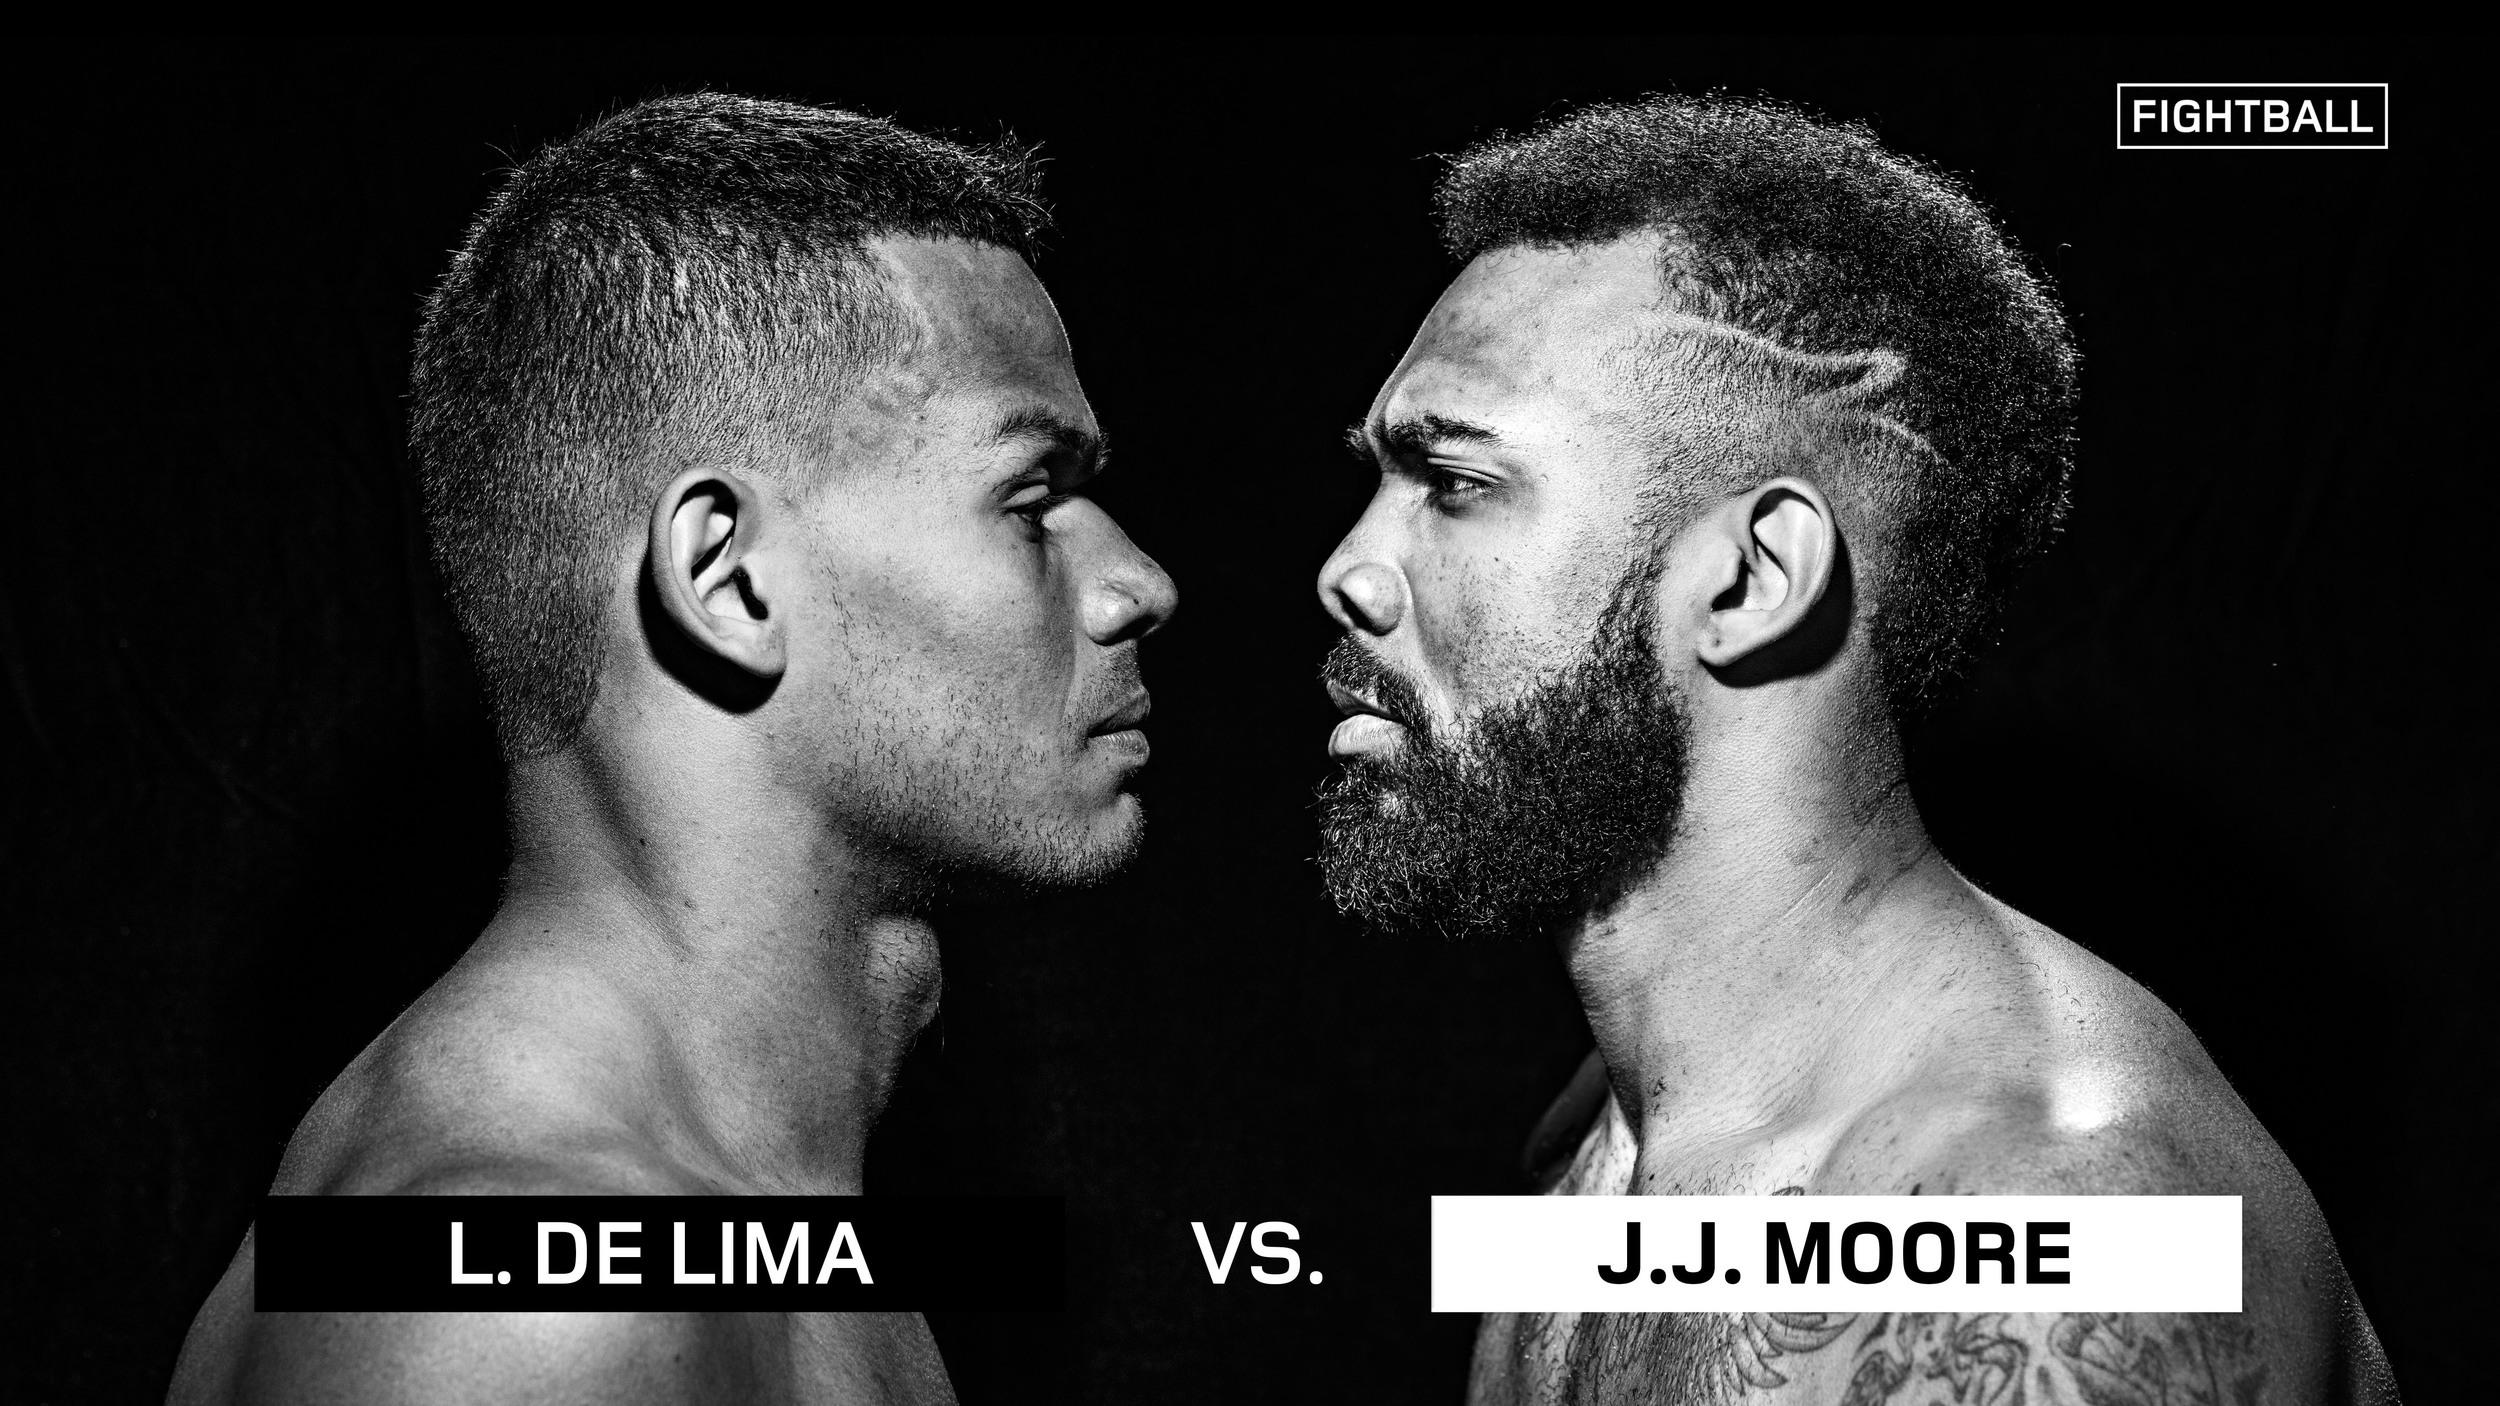 DE_LIMA_VS_MOORE.jpg